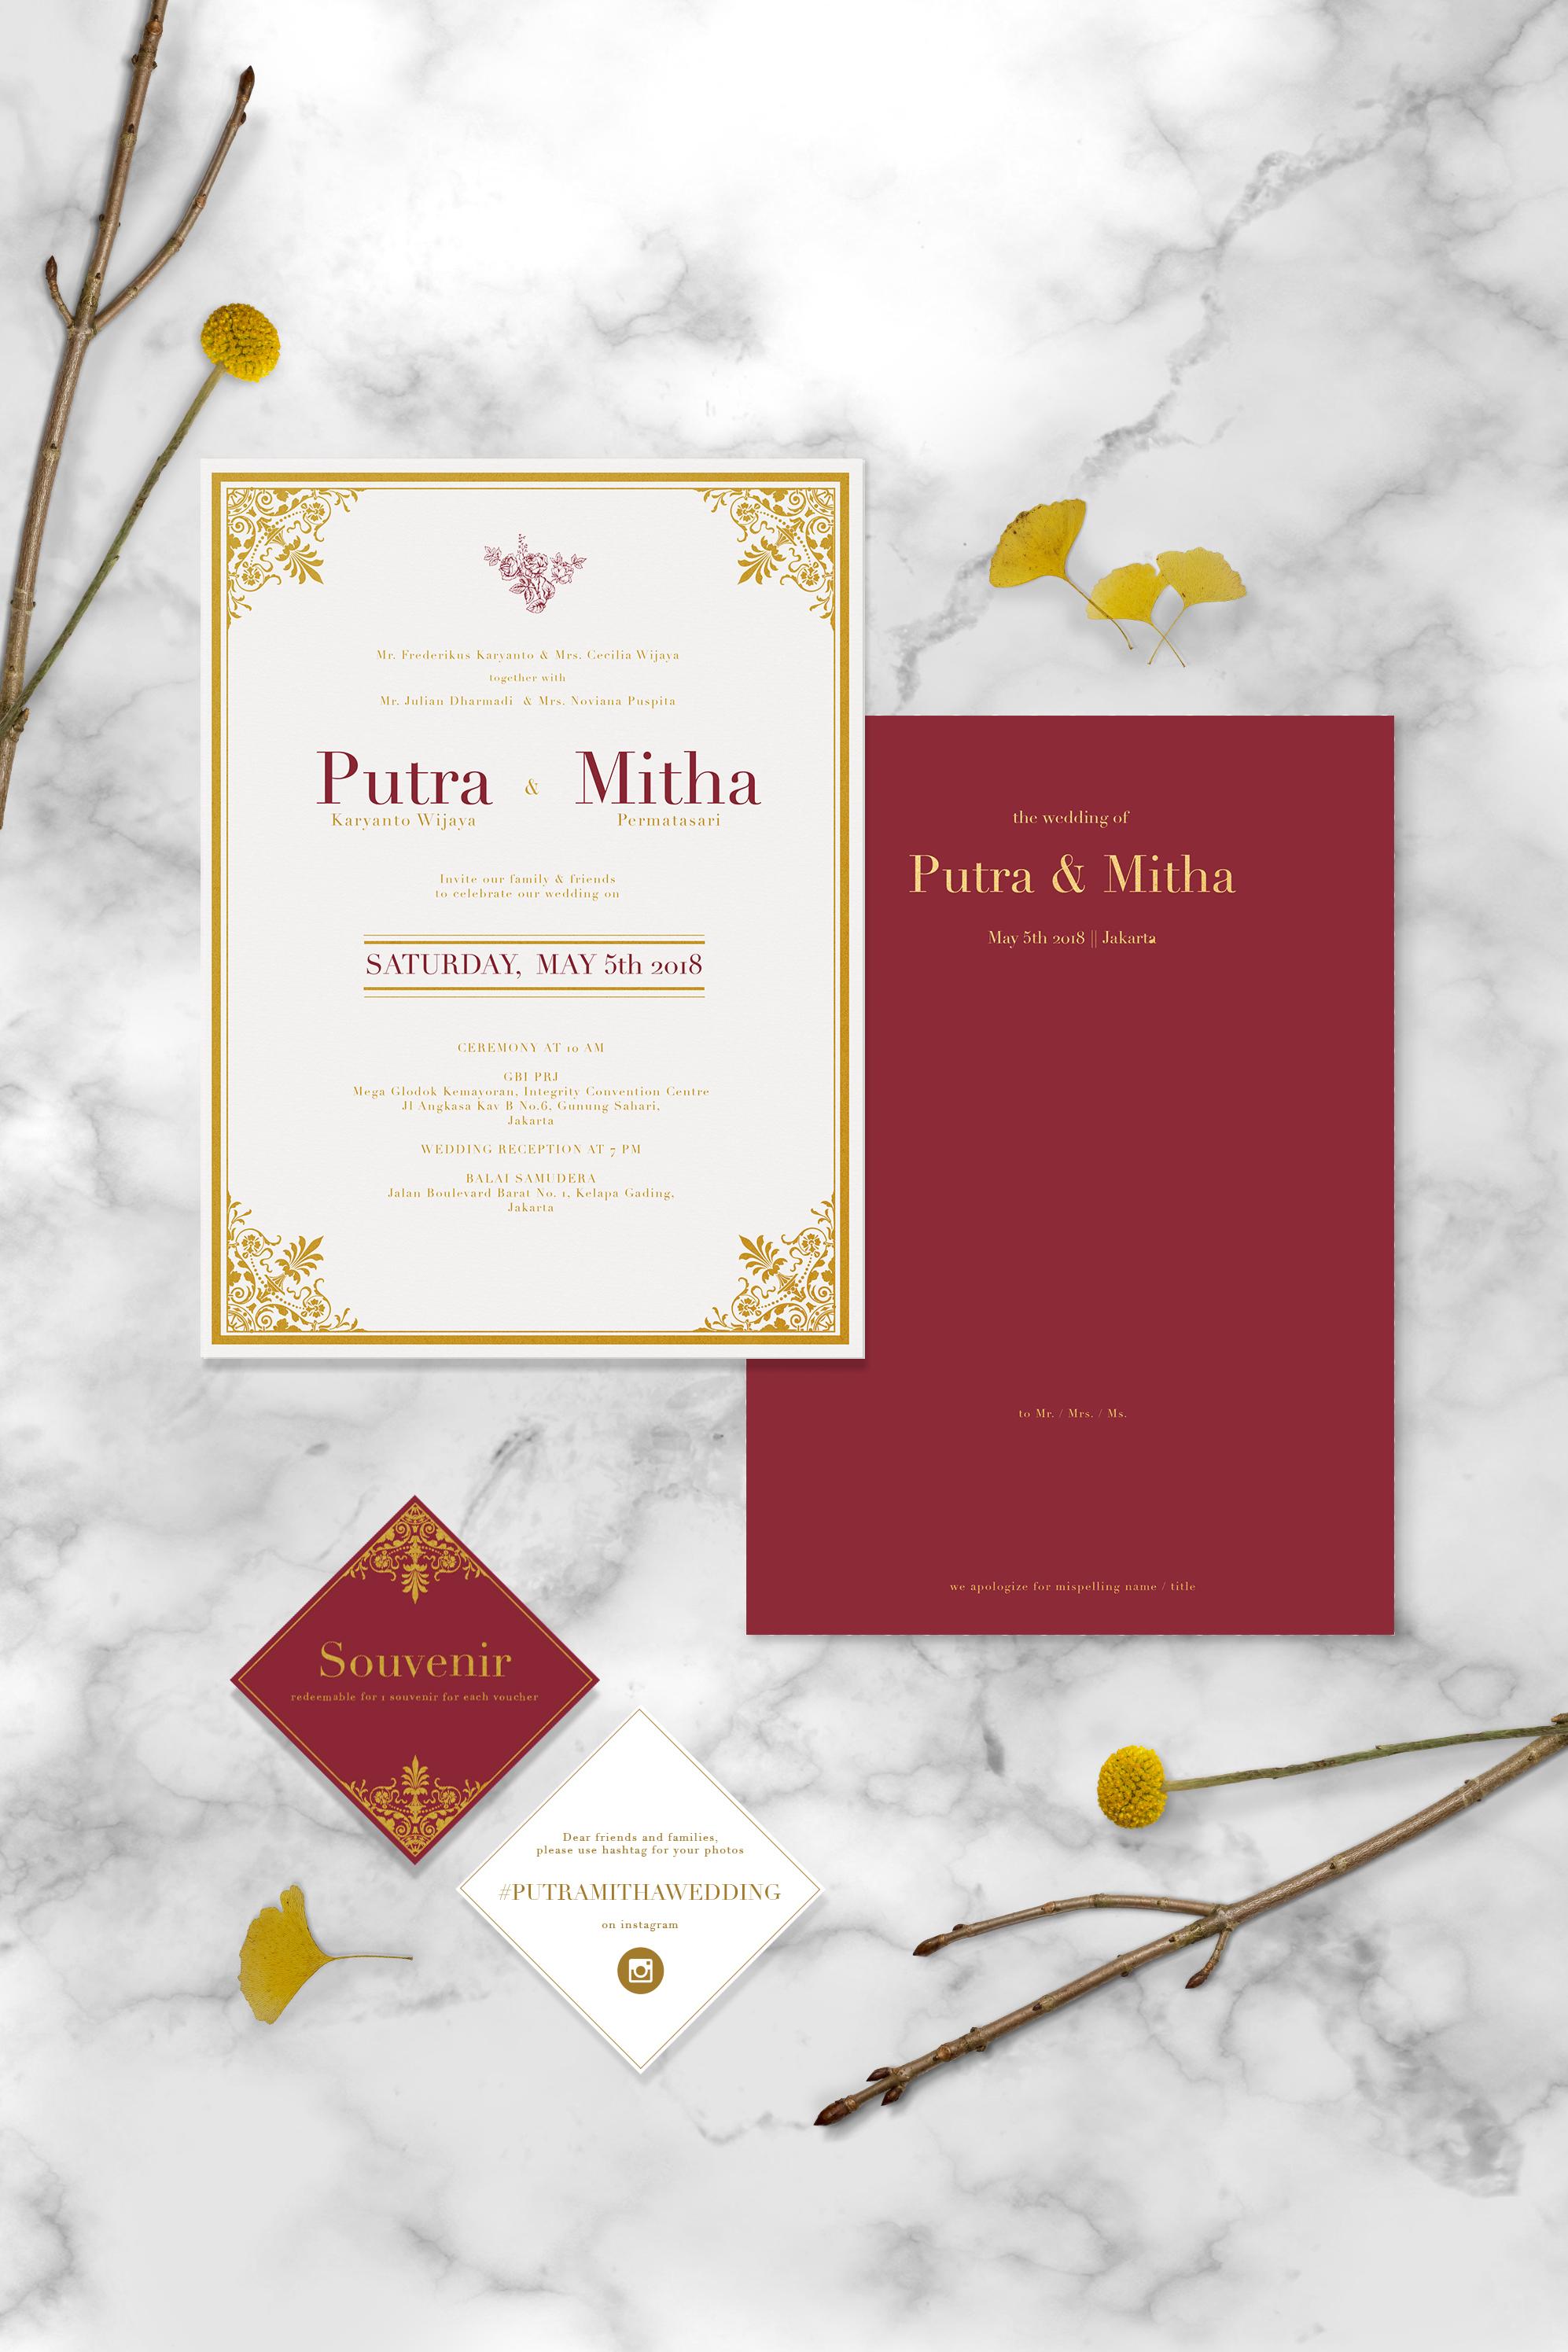 Putra & Mitha by Petite Chérie Invitation | Bridestory.com